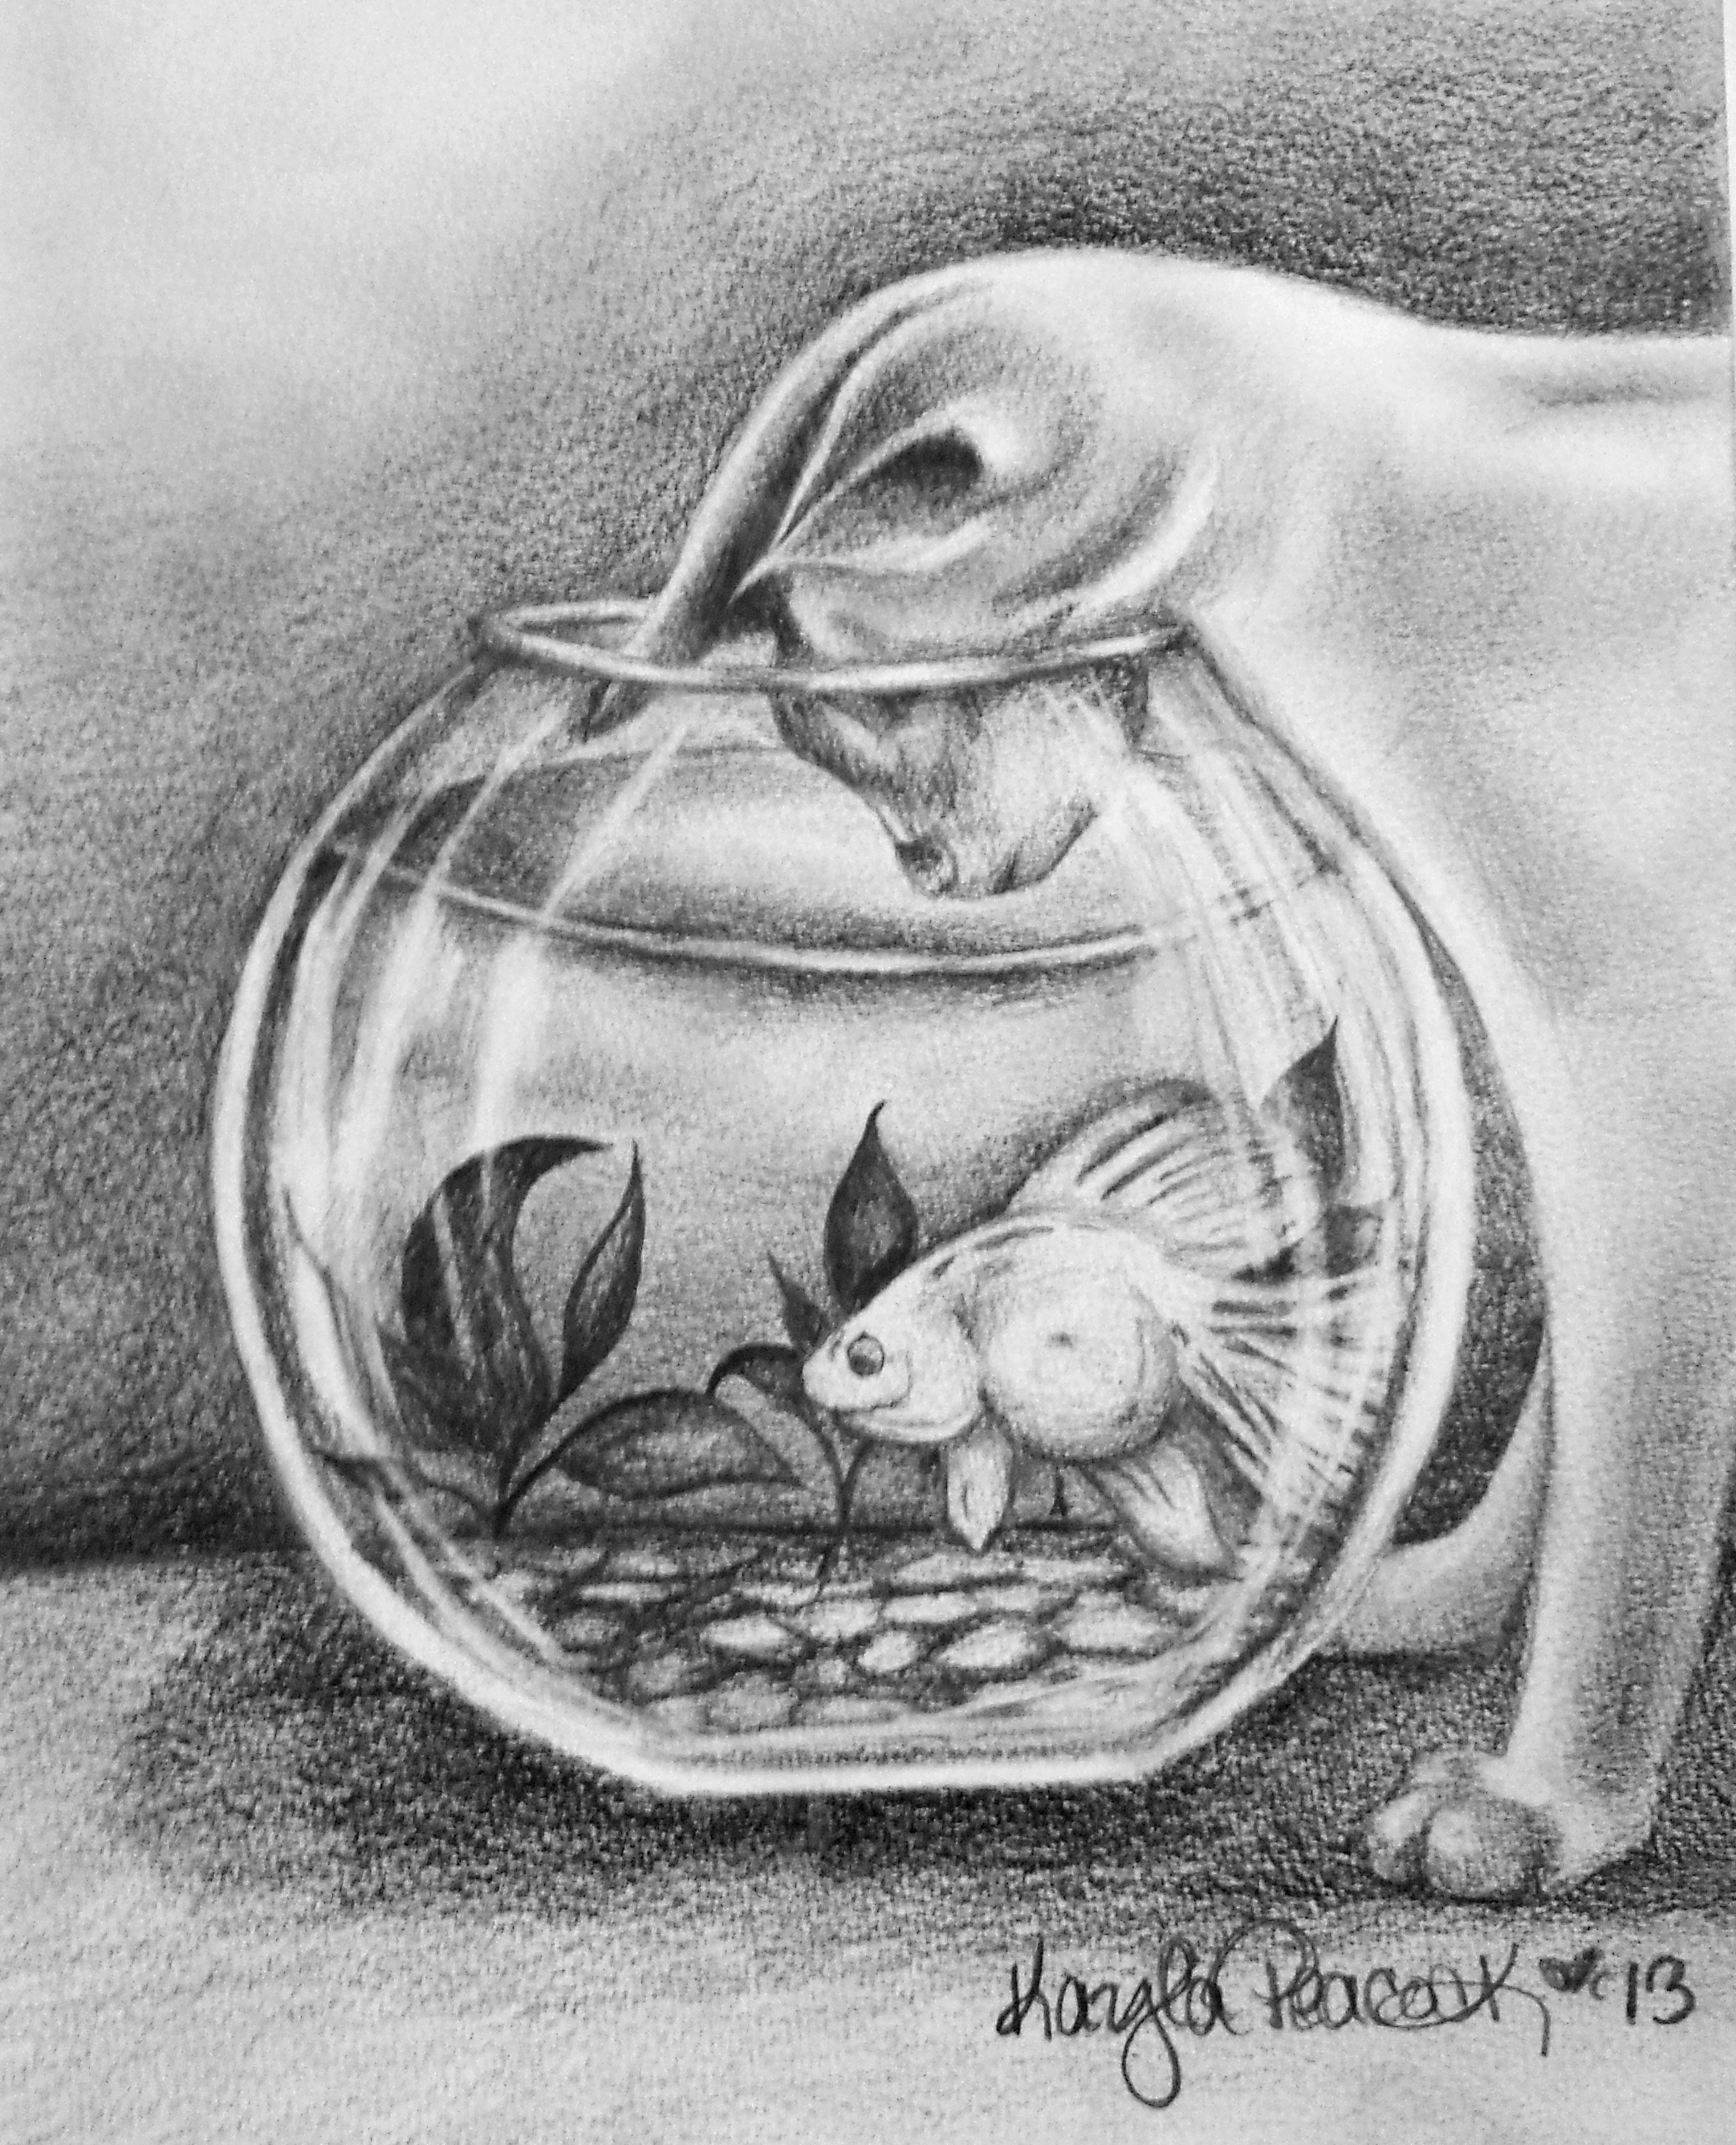 Drawn fish The Sketchbook Cat Fishbowl shading